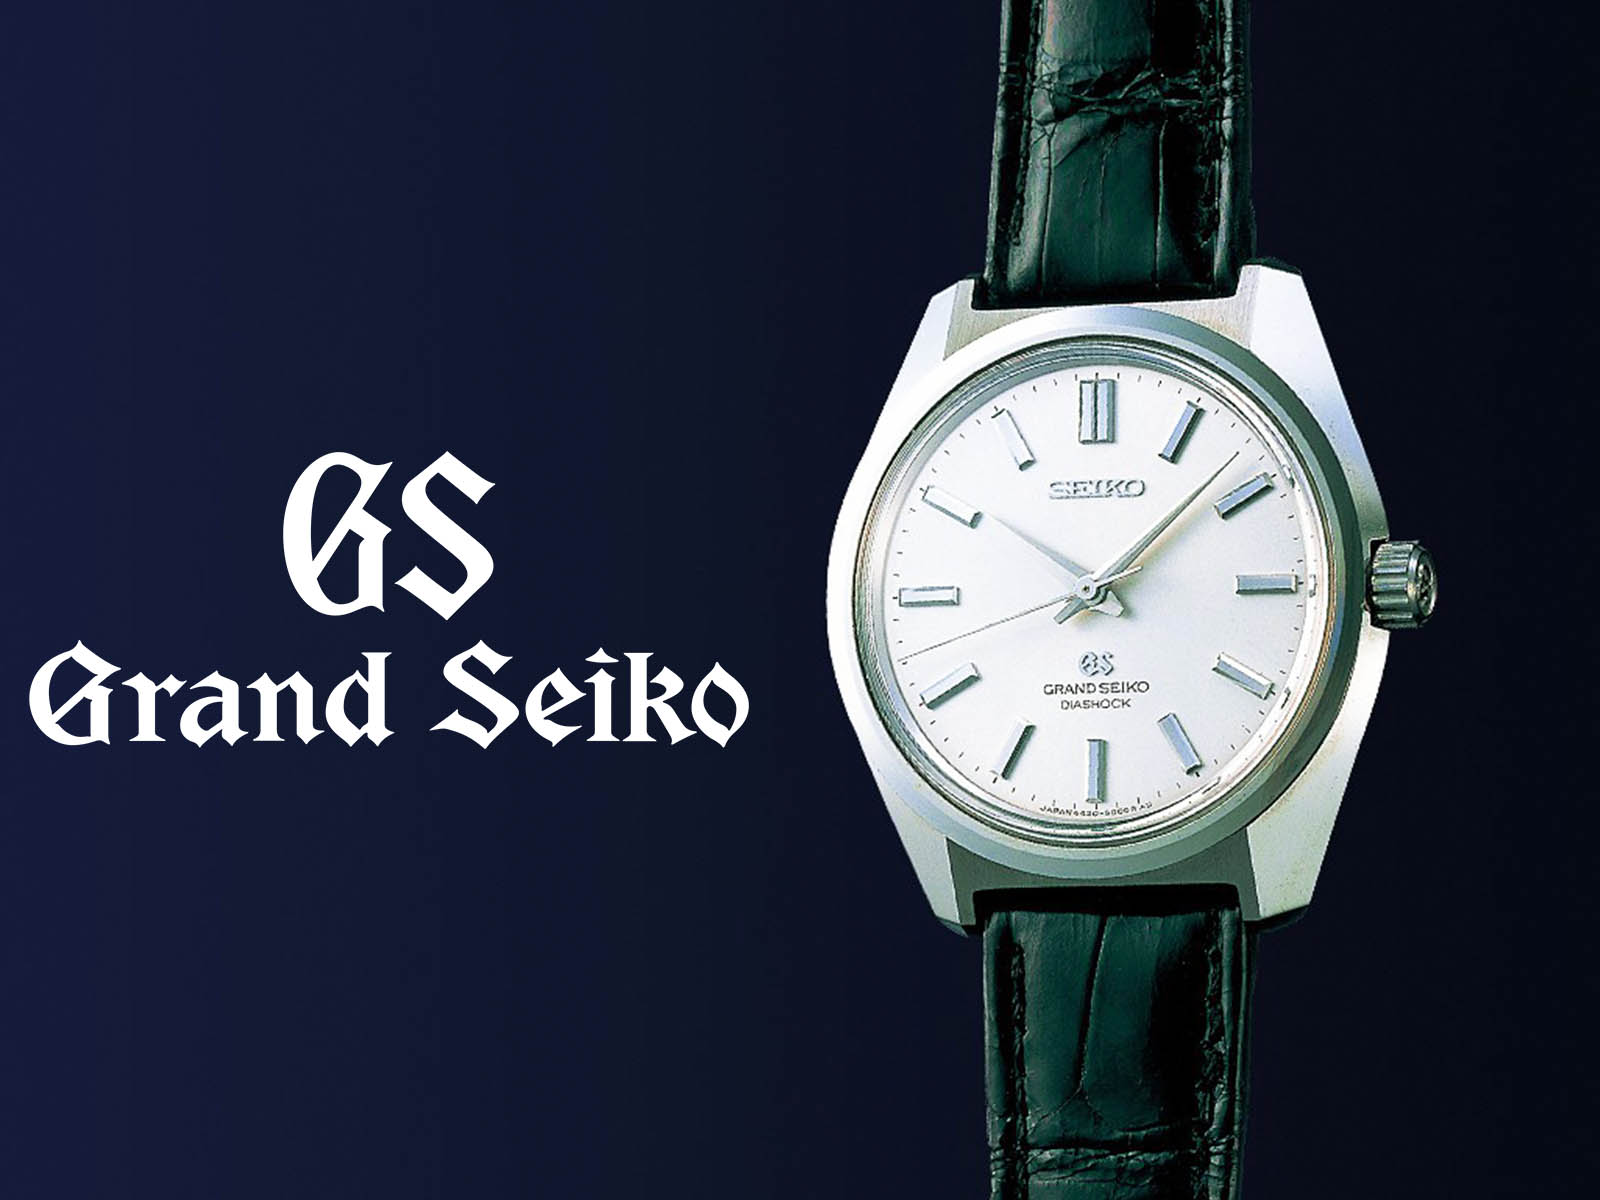 grand-seiko-44gs.jpg